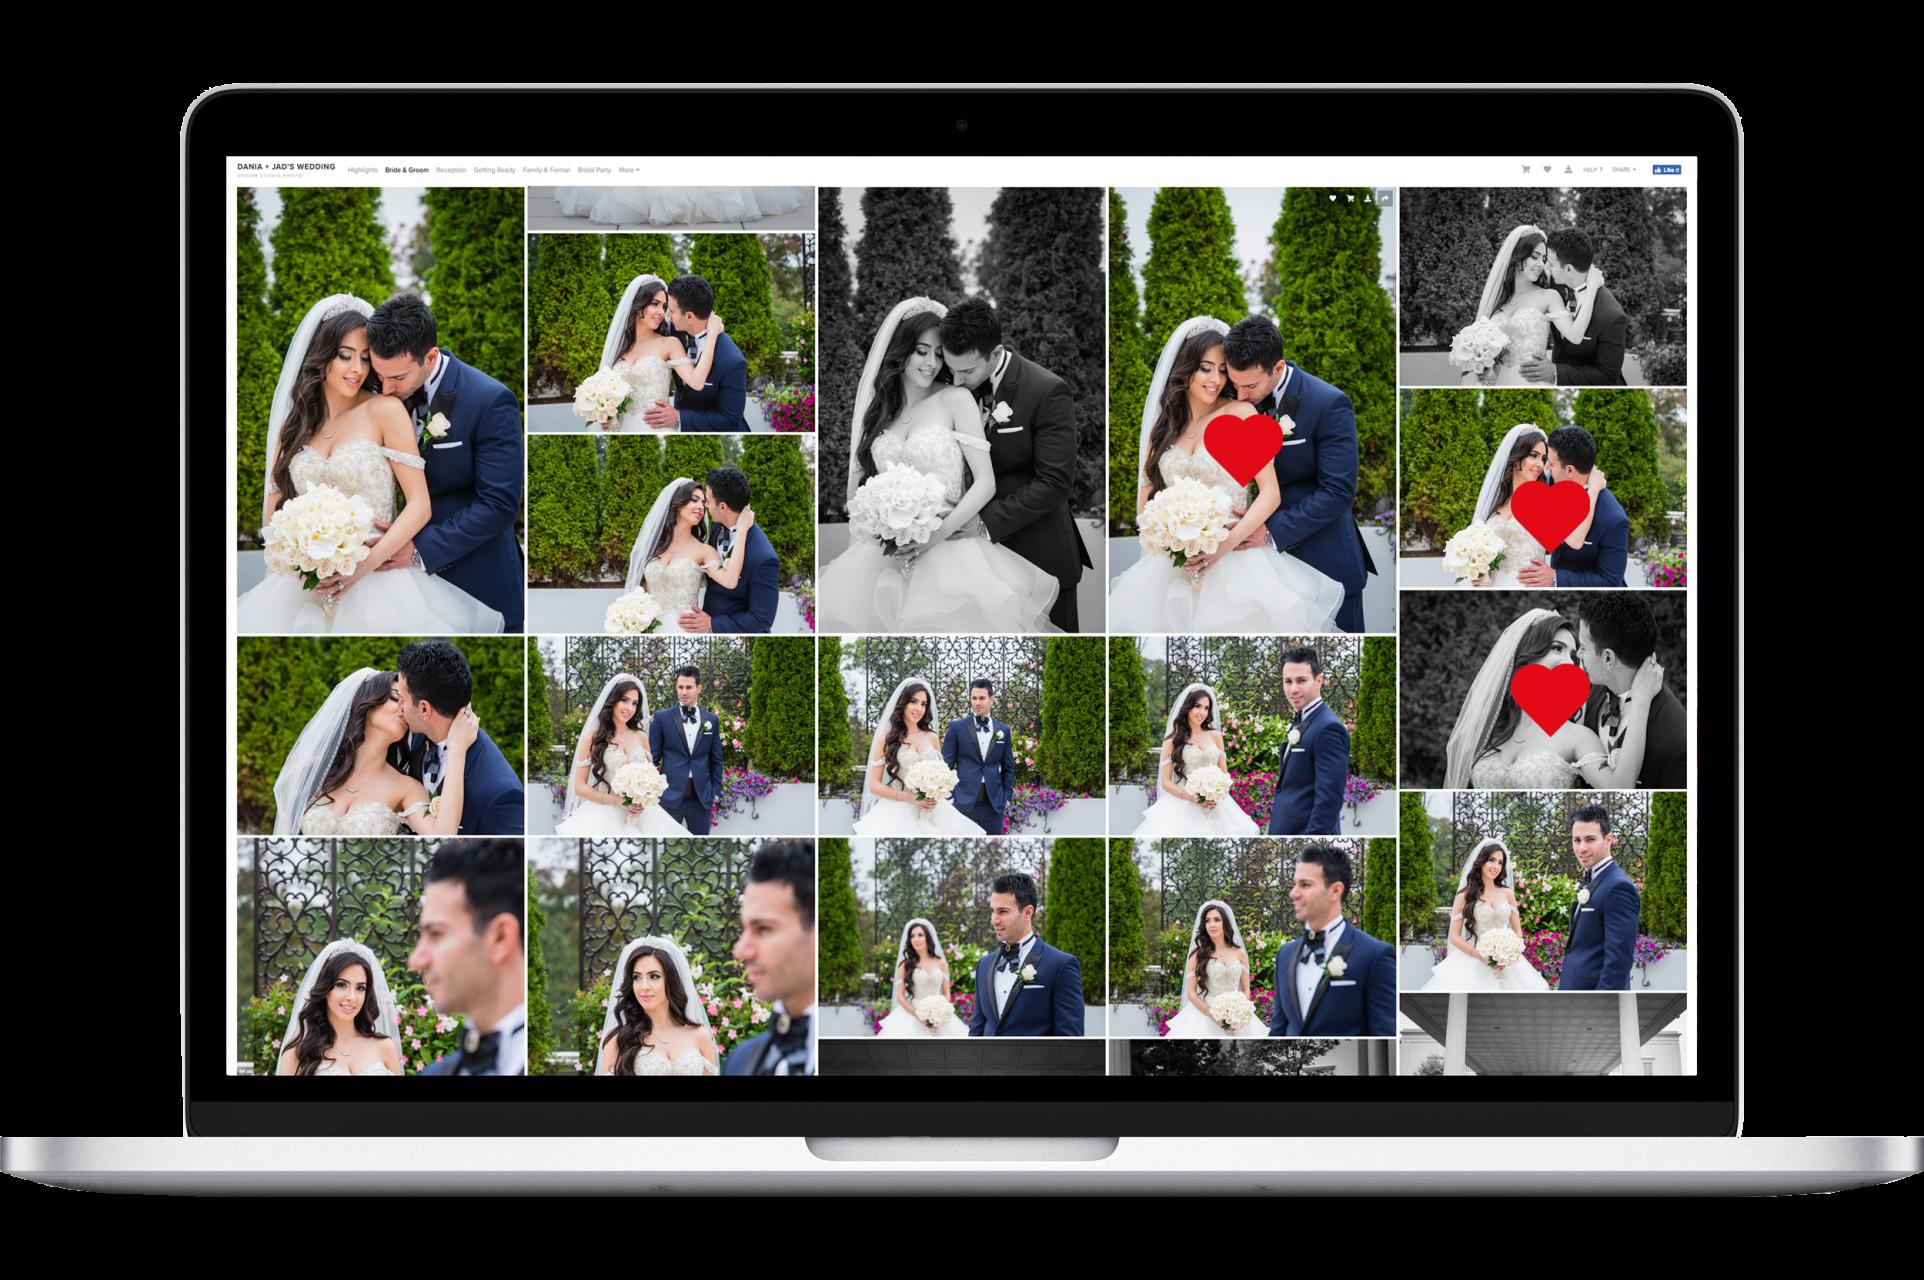 dspv_favorite_macbook-e1579848148843 Photo Editing